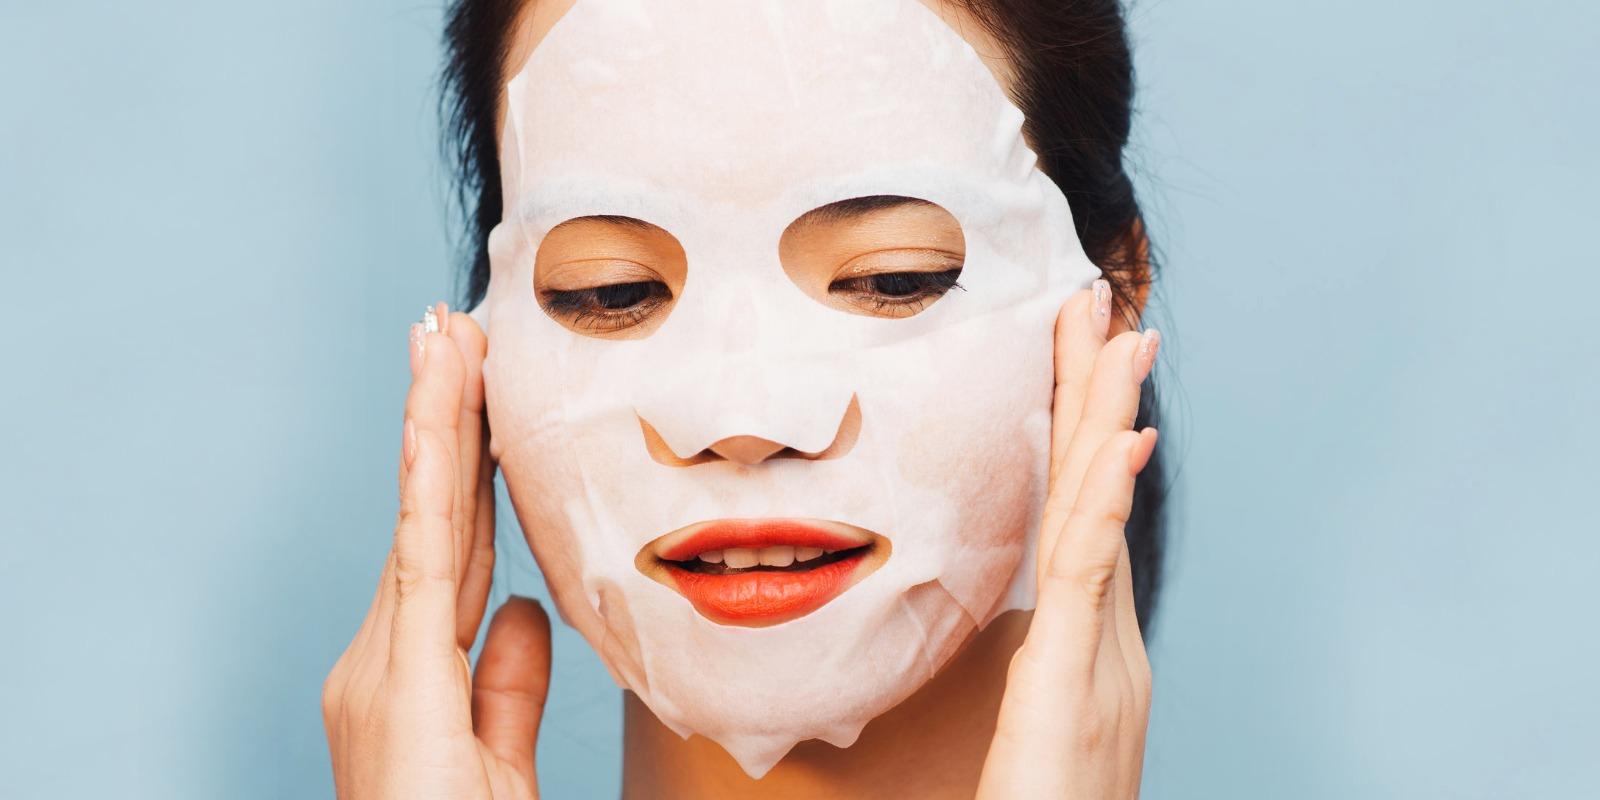 applicazione maschera viso sos beauty